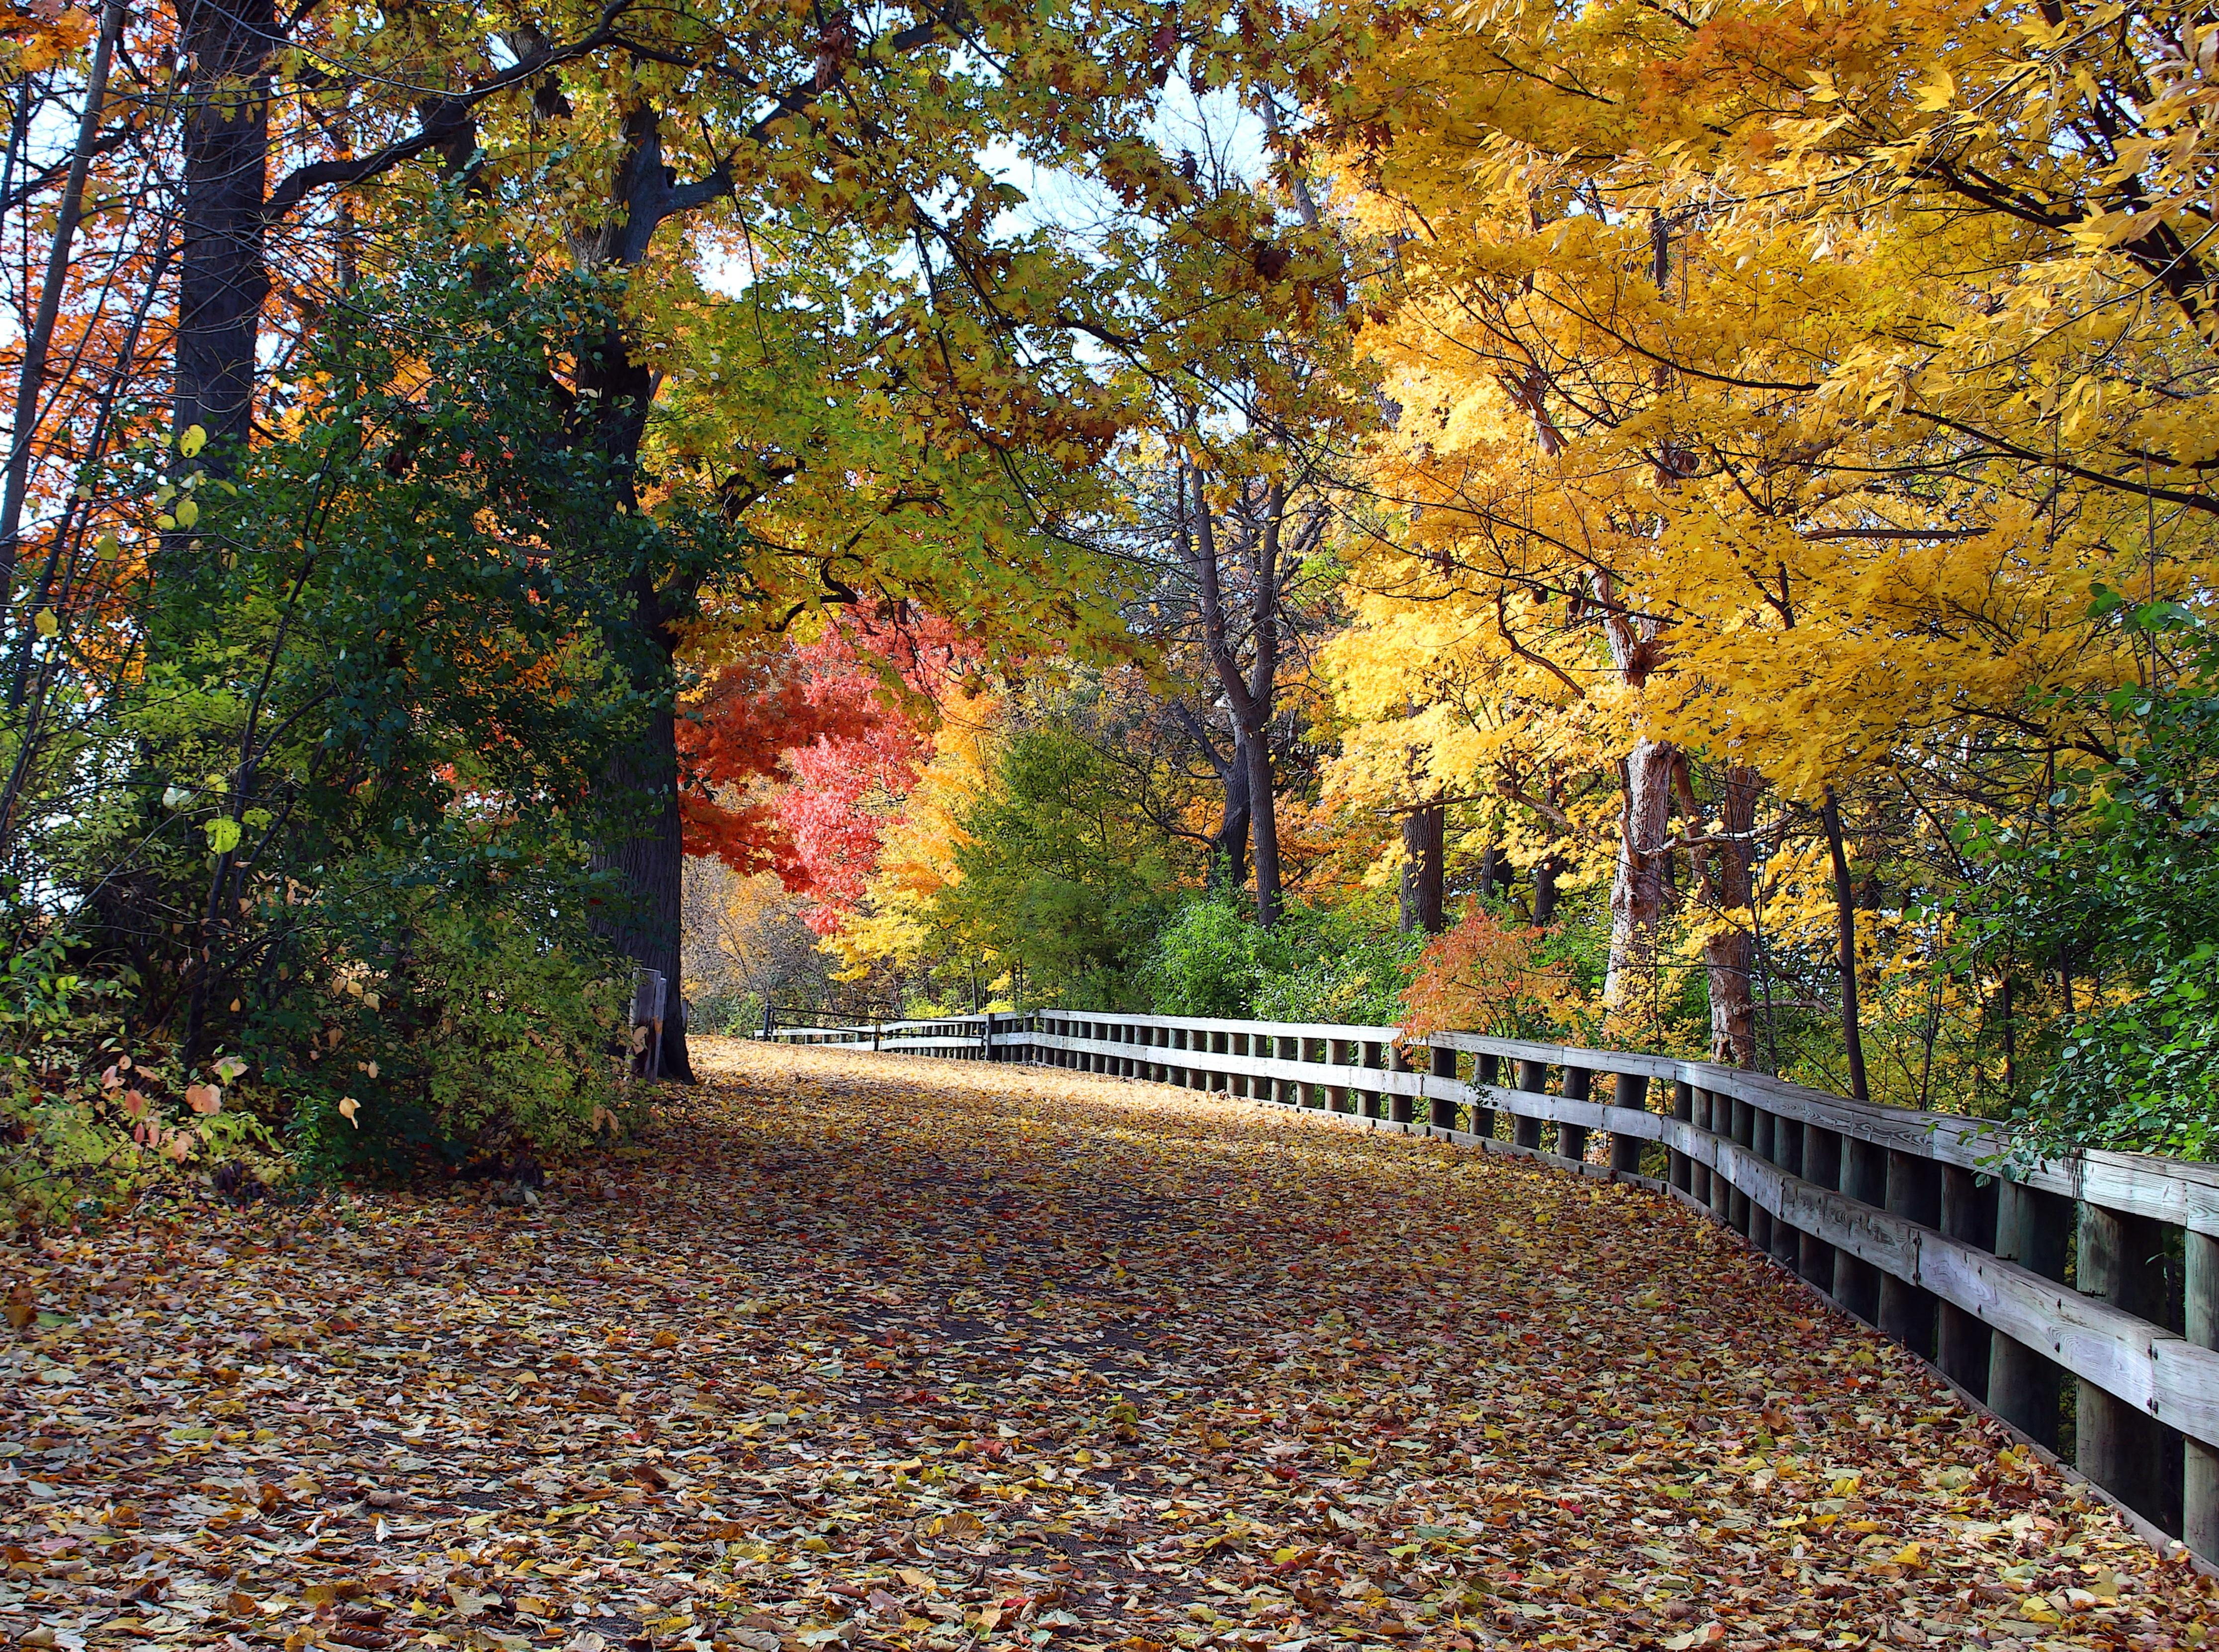 101+ Gambar Pemandangan Warna Kuning Paling Bagus